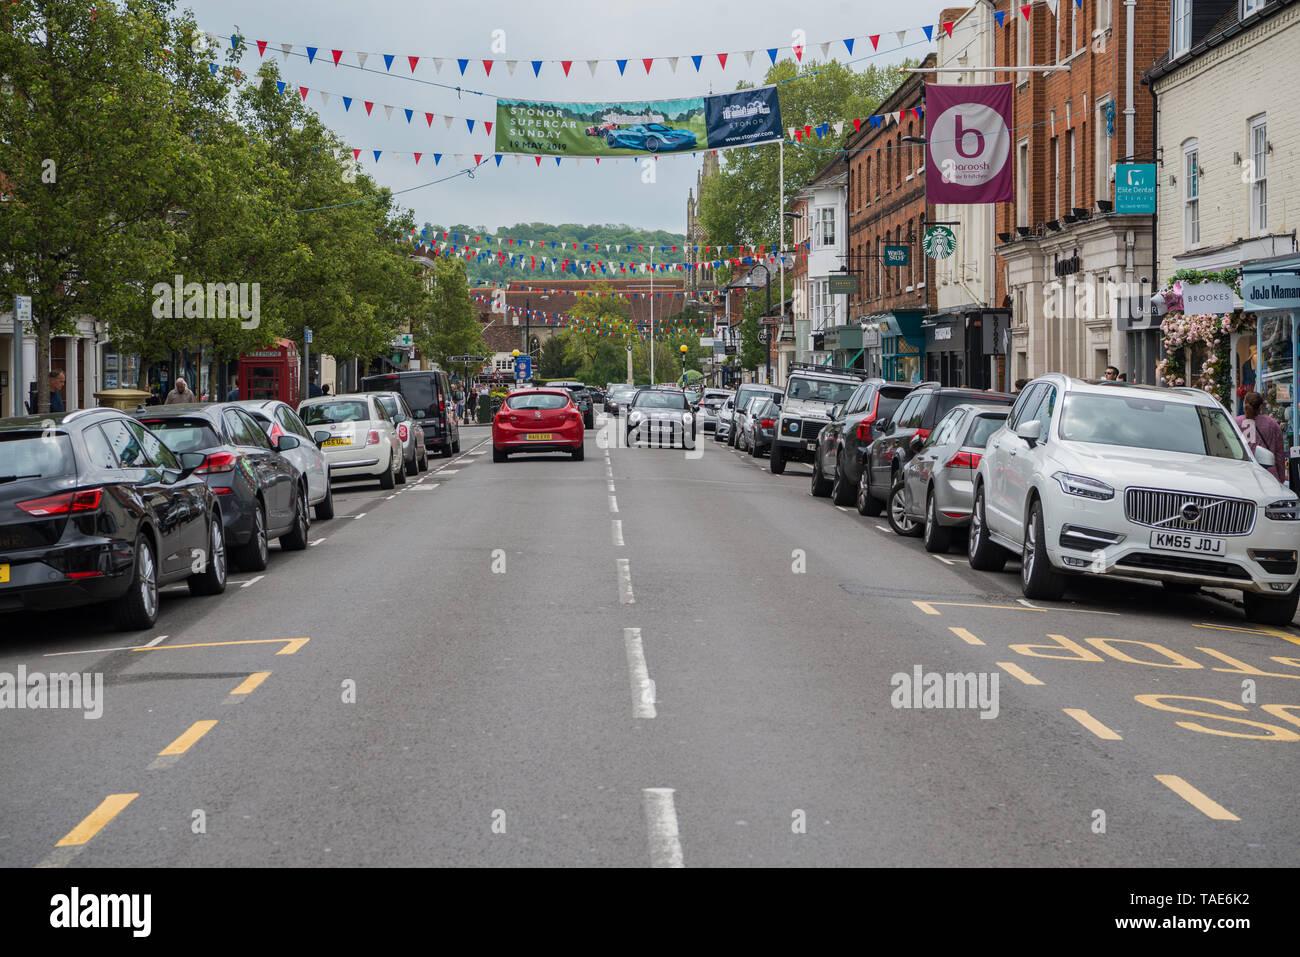 View of Marlow High street towards the bridge. Stock Photo